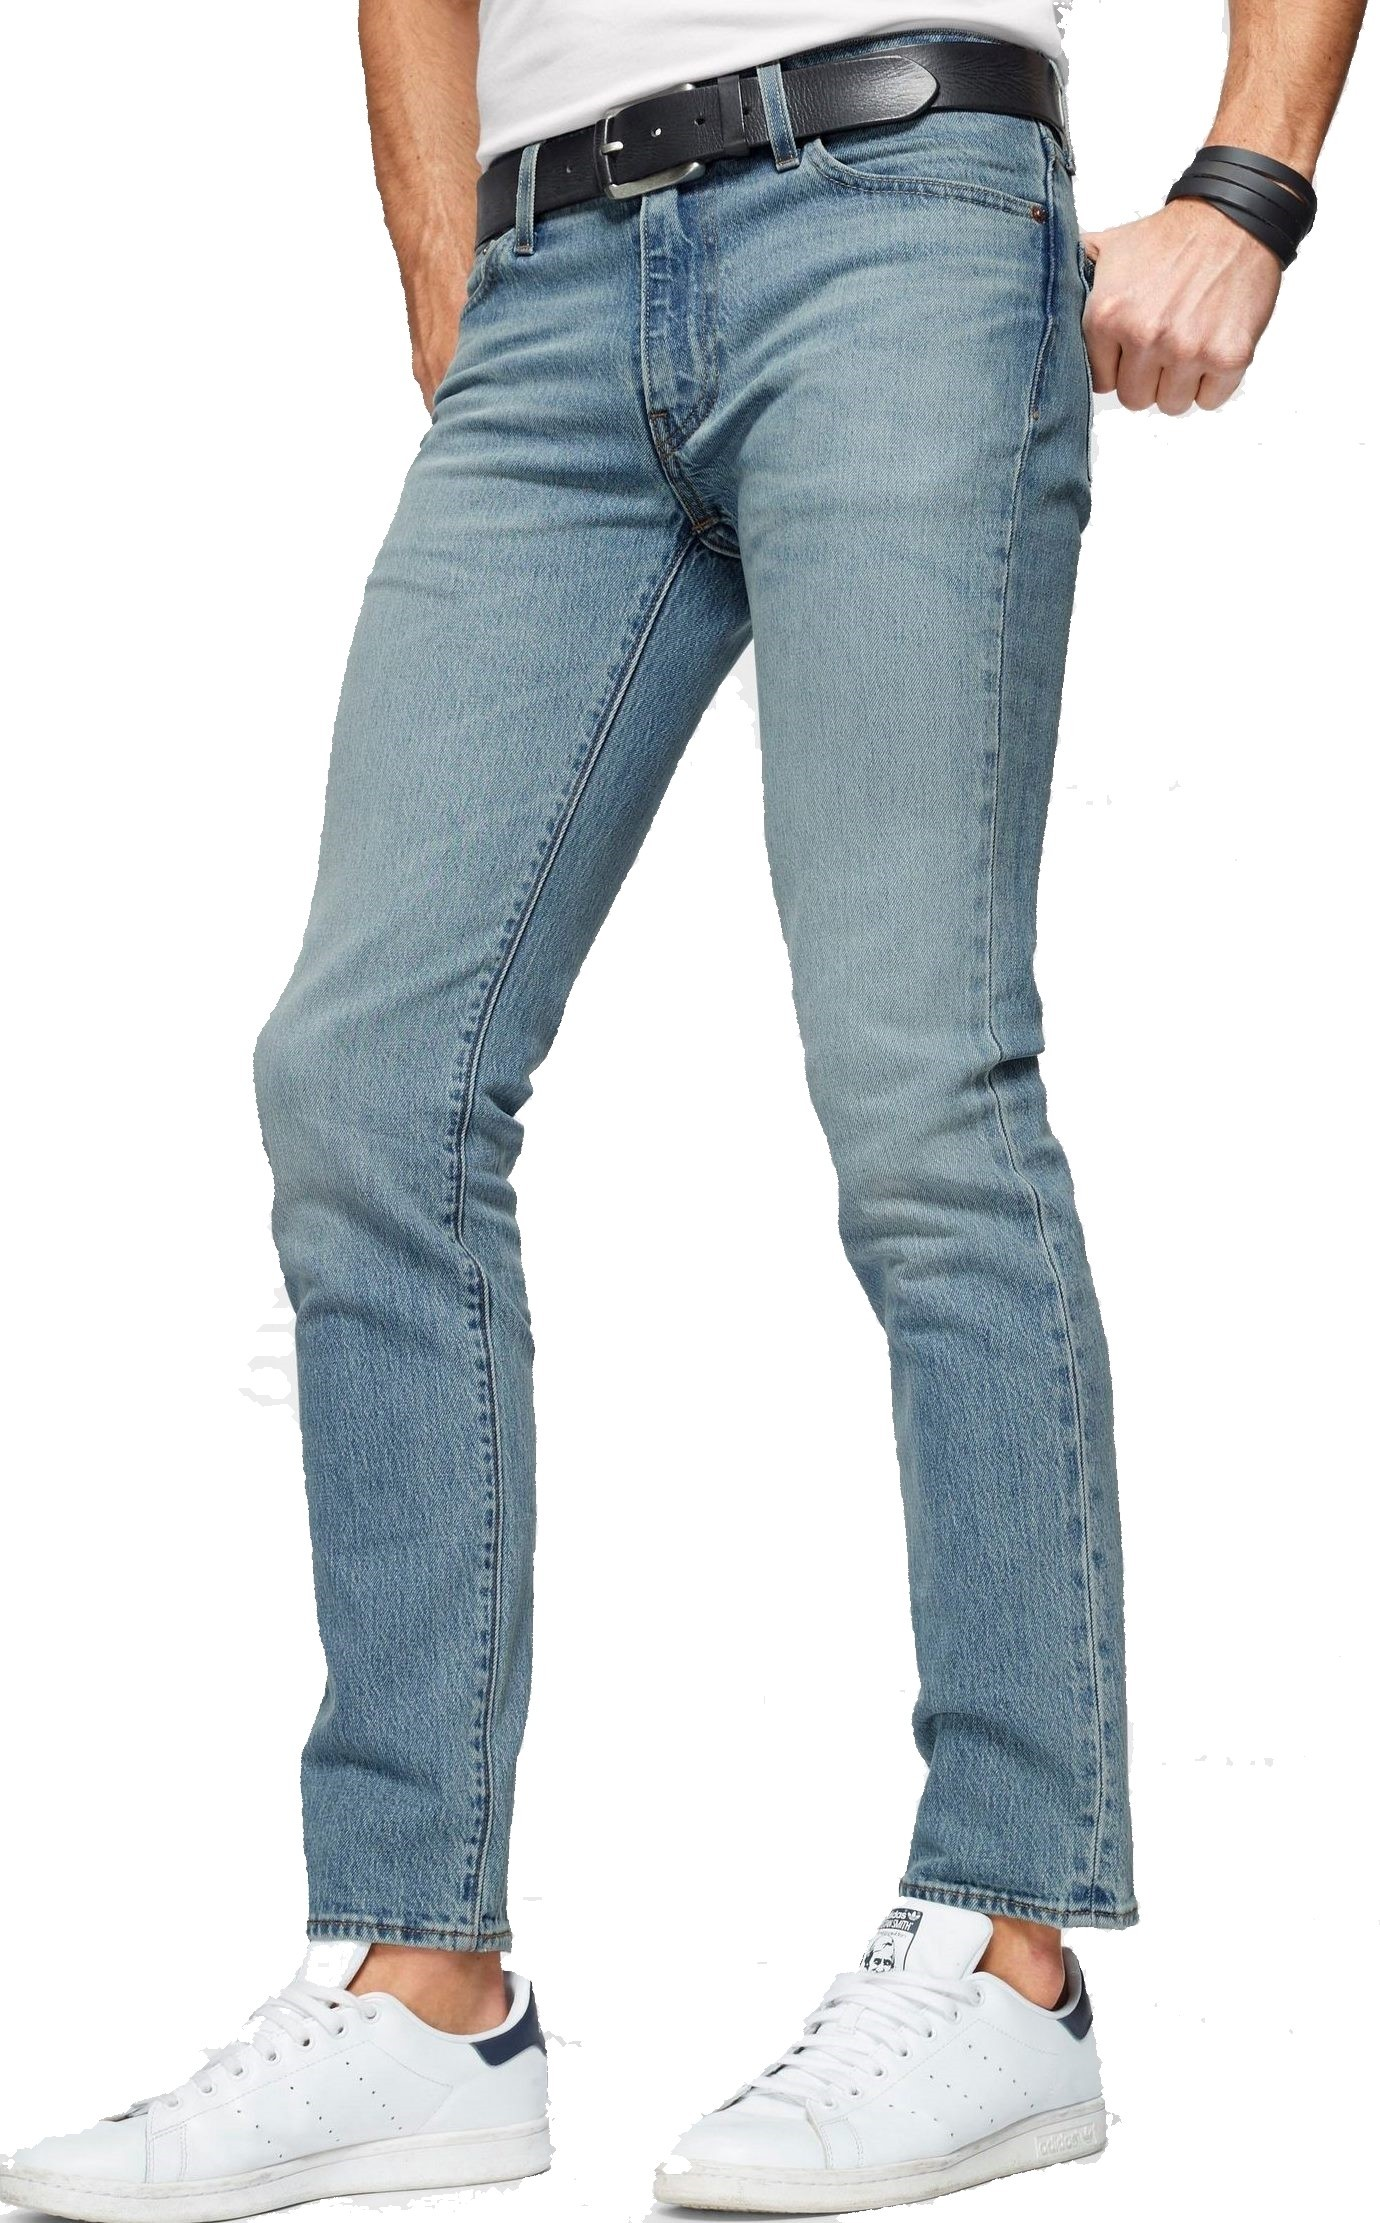 LEVI'S Herren Jeans 511 Slim Stone Washed